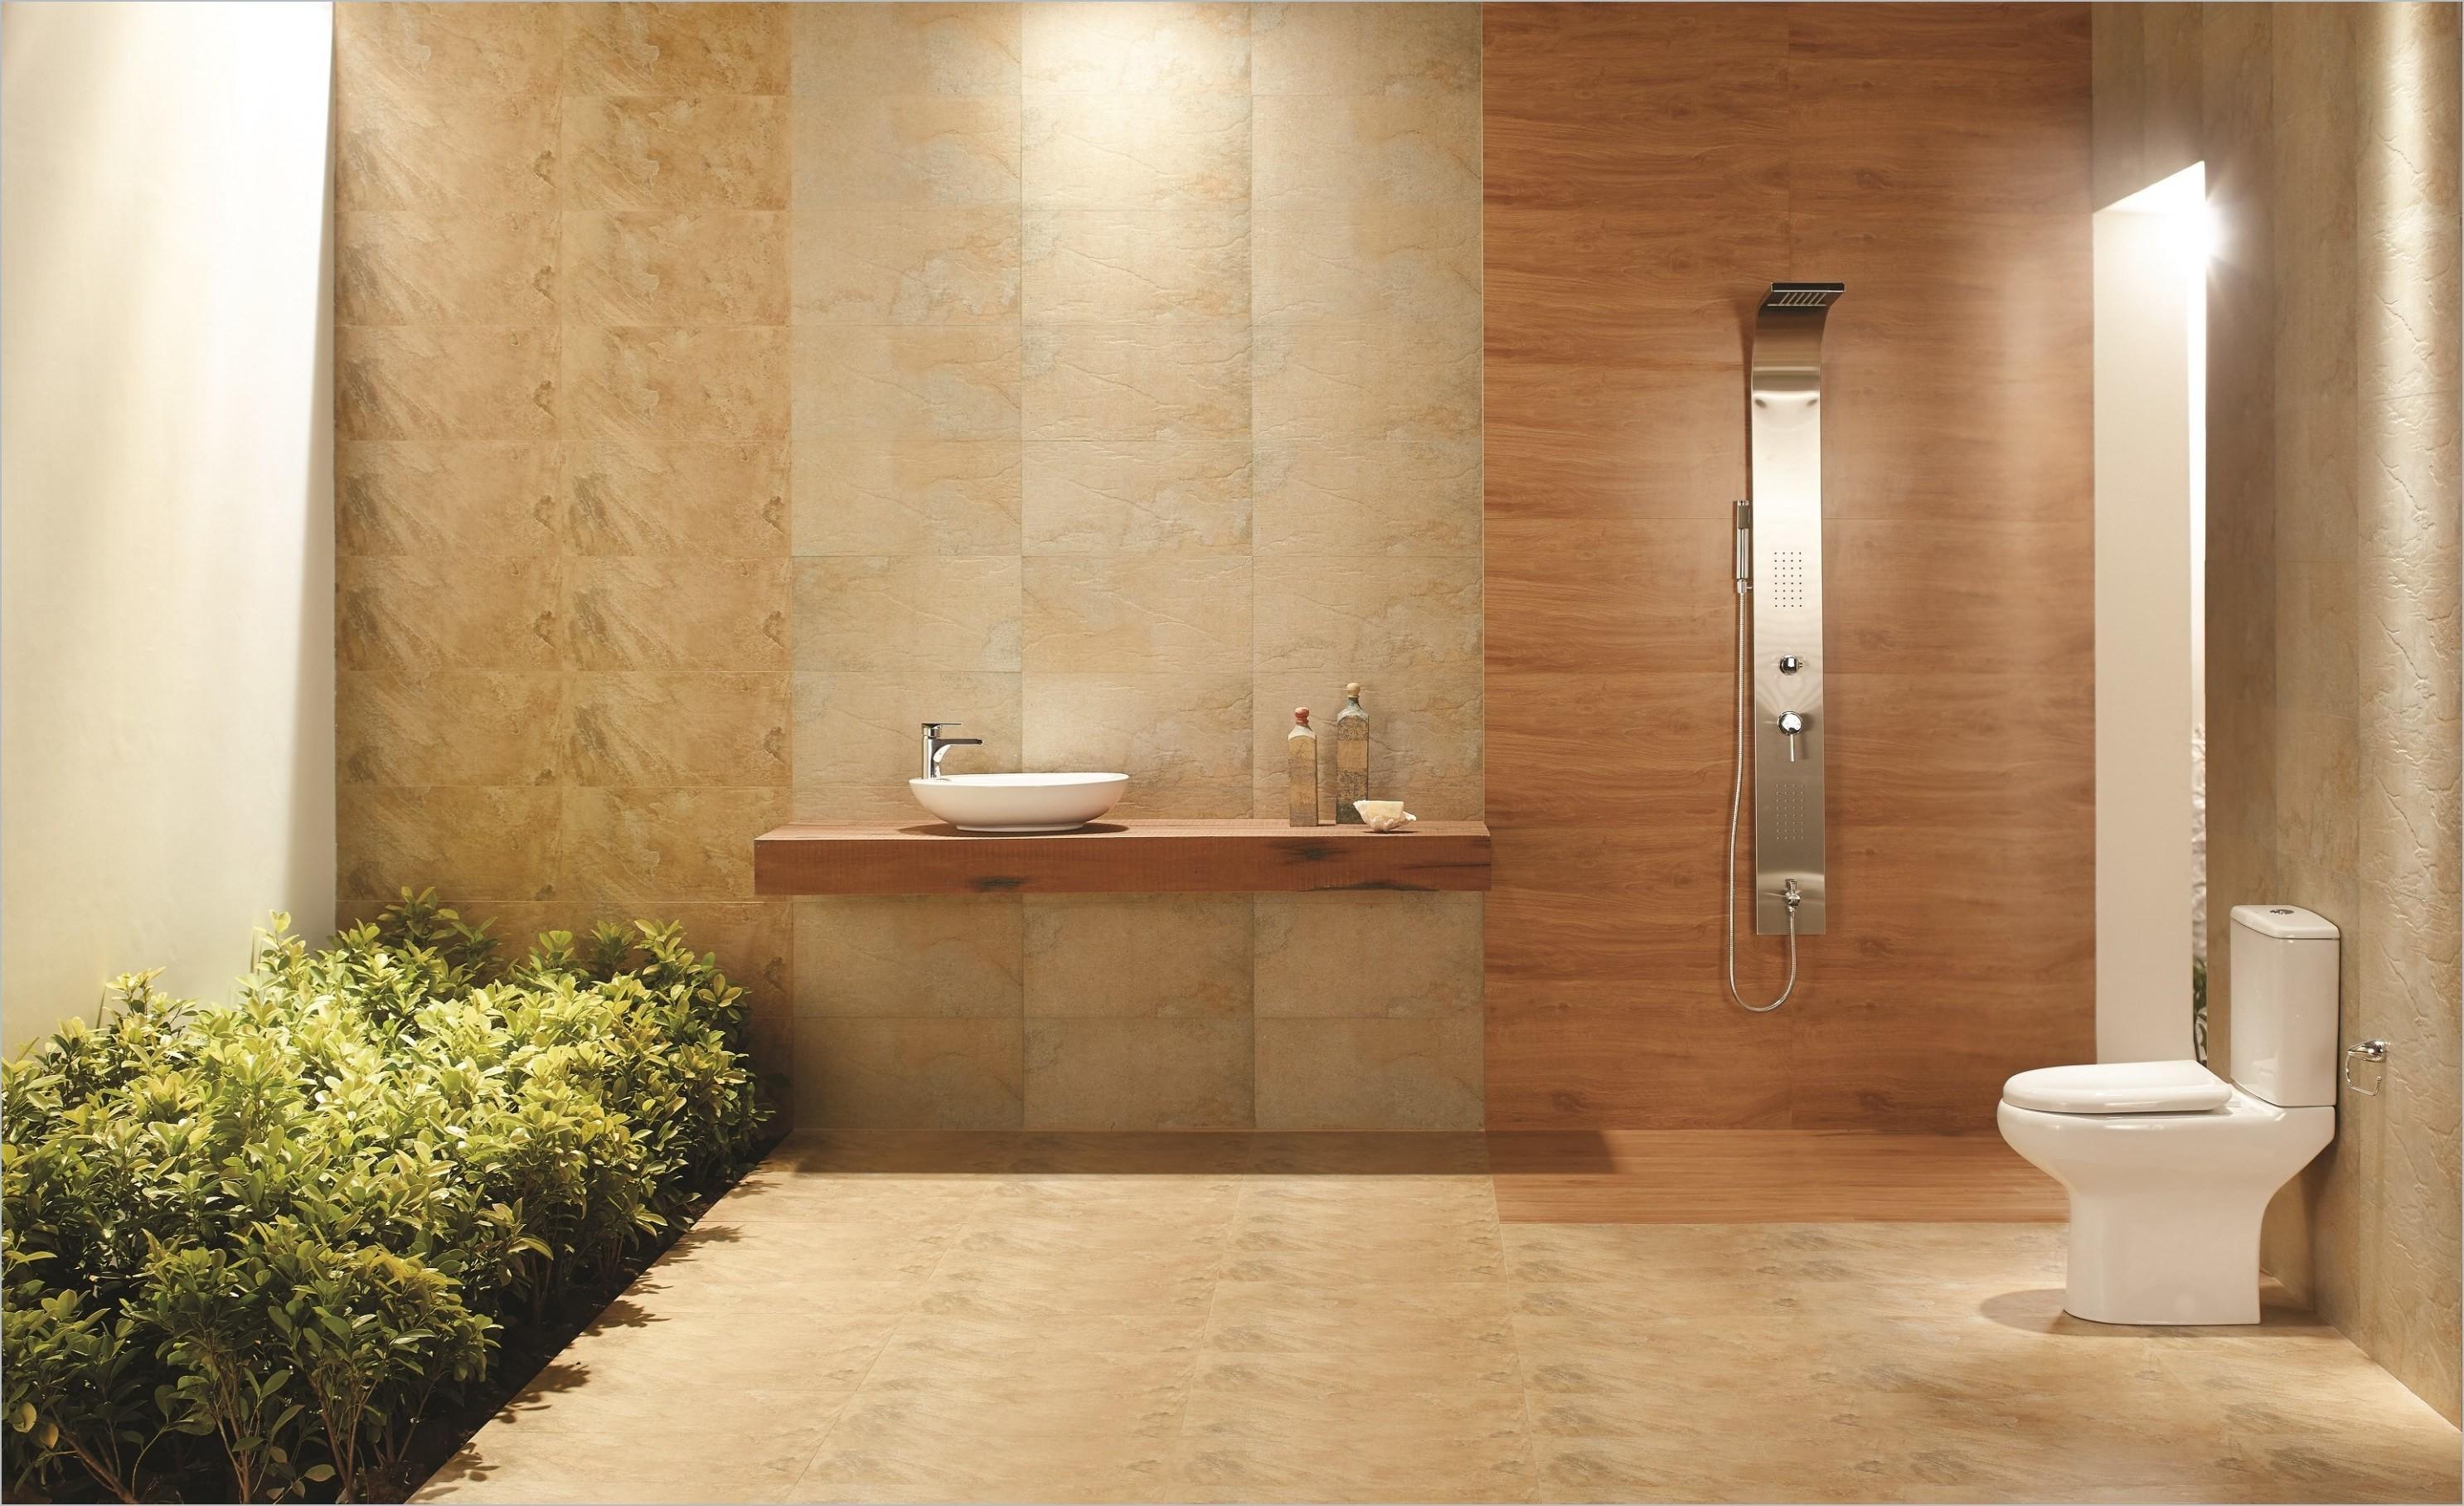 Indian Wall Tiles Designs Kitchen Interior Design Ideas Decoratorist 72288